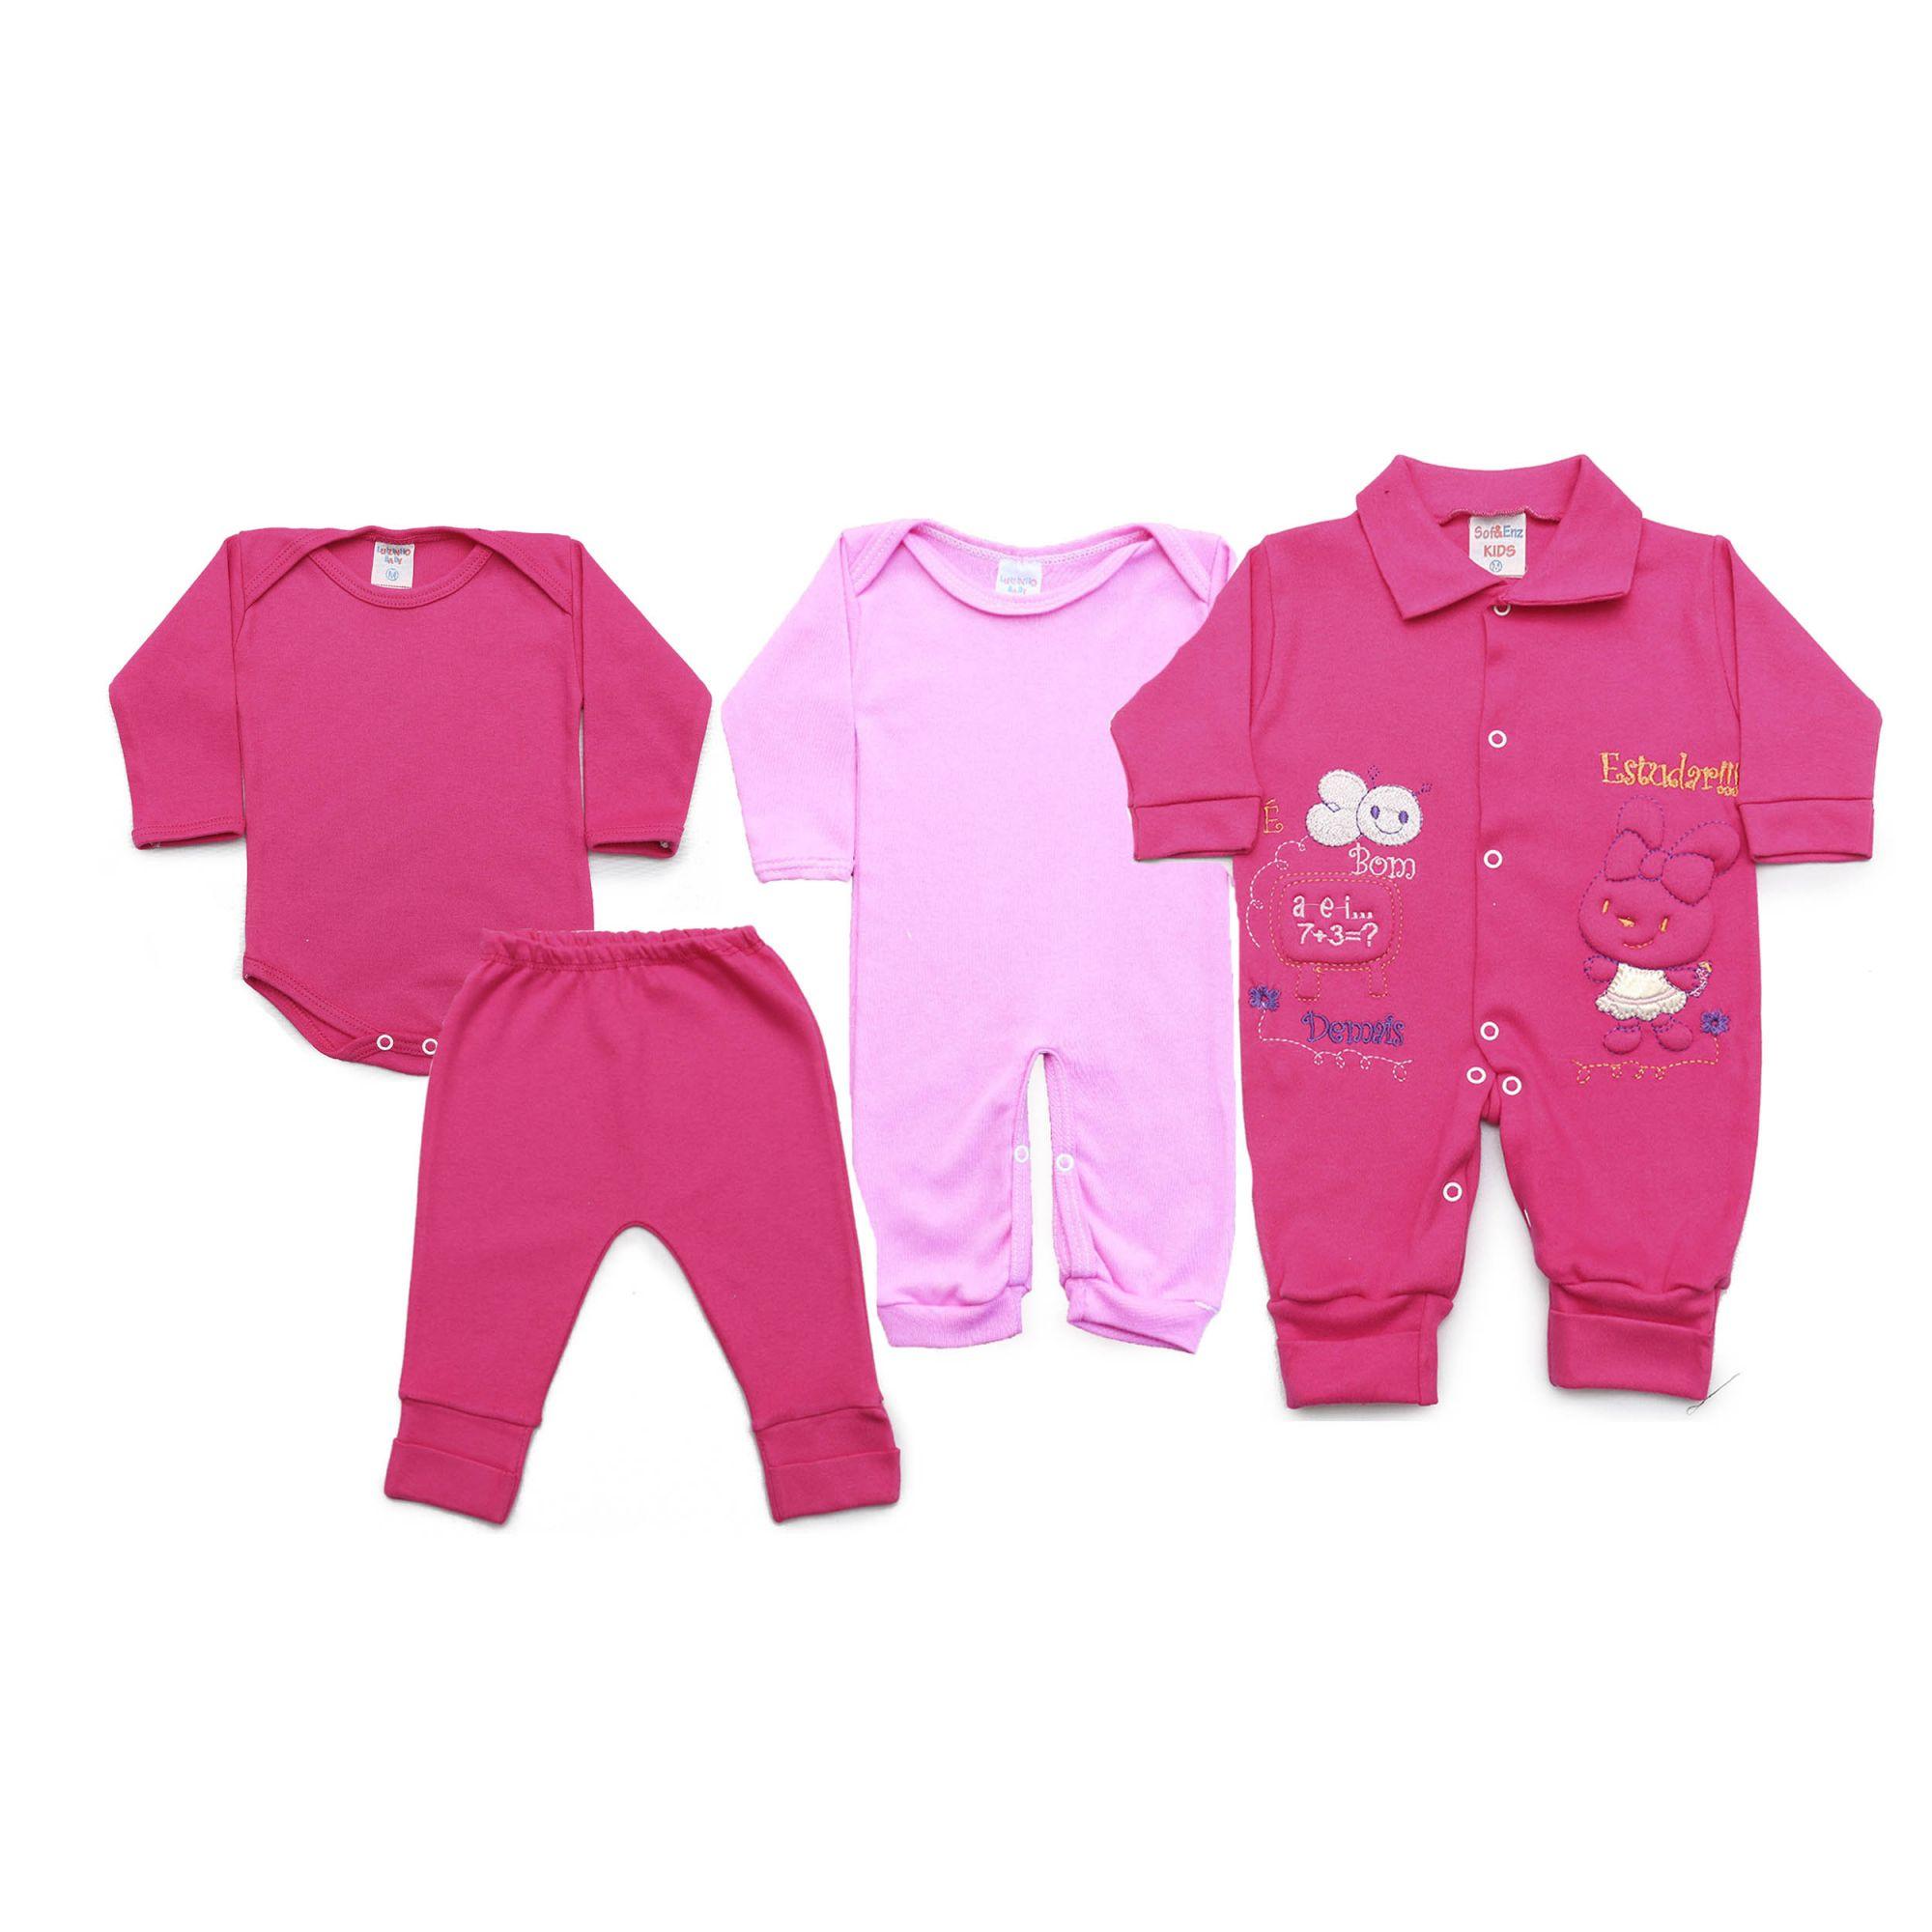 Kit Bebê com 4 Peças Menina Rosa